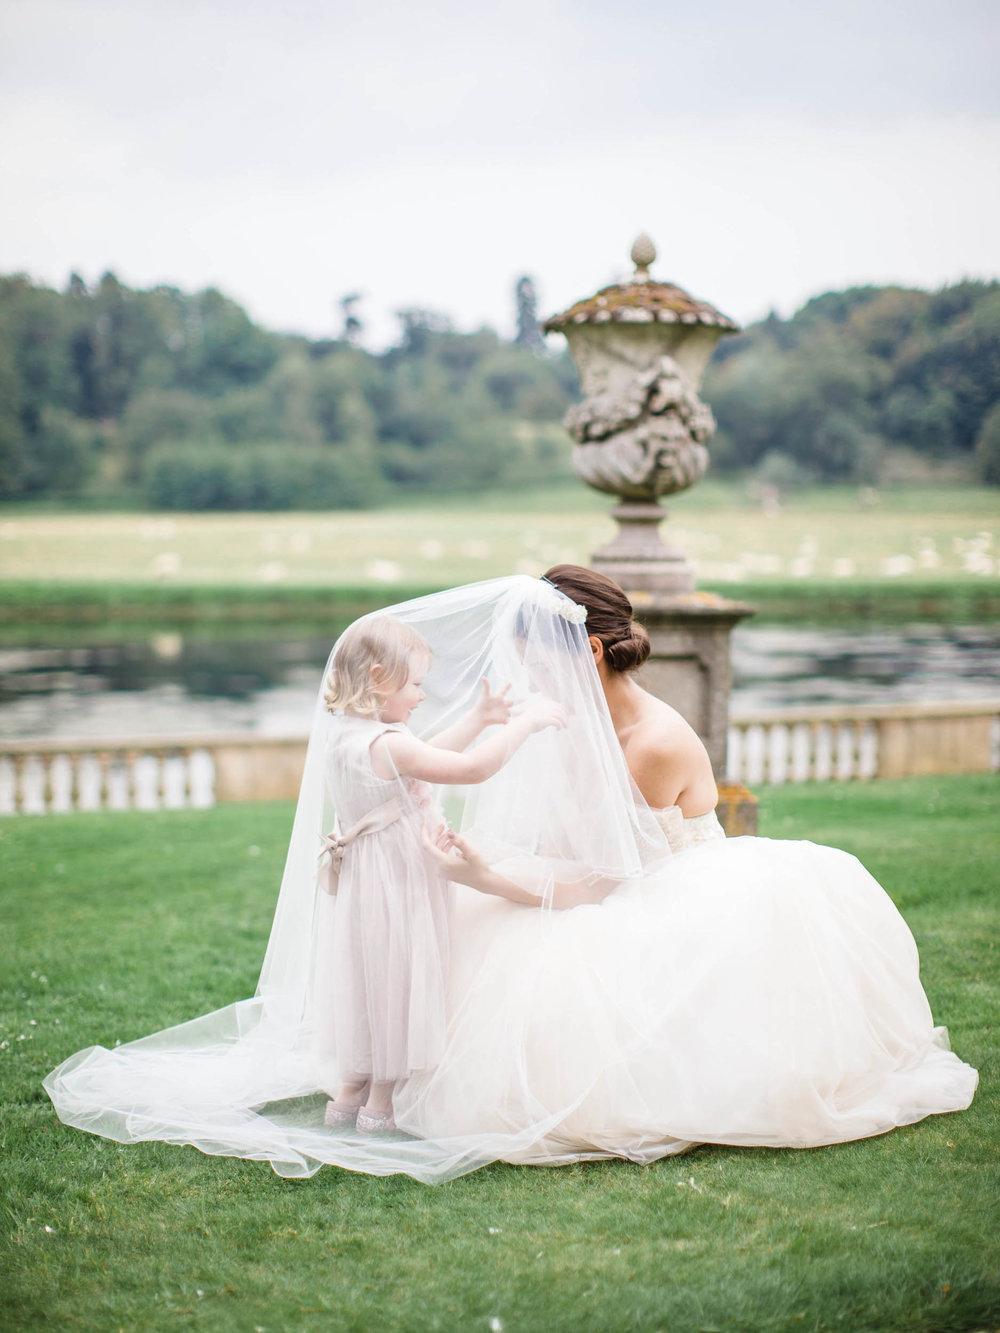 Amy O'Boyle Photography- Destination & UK Fine Art Film Wedding Photographer- Stoneleigh Abbey Wedding-18.jpg